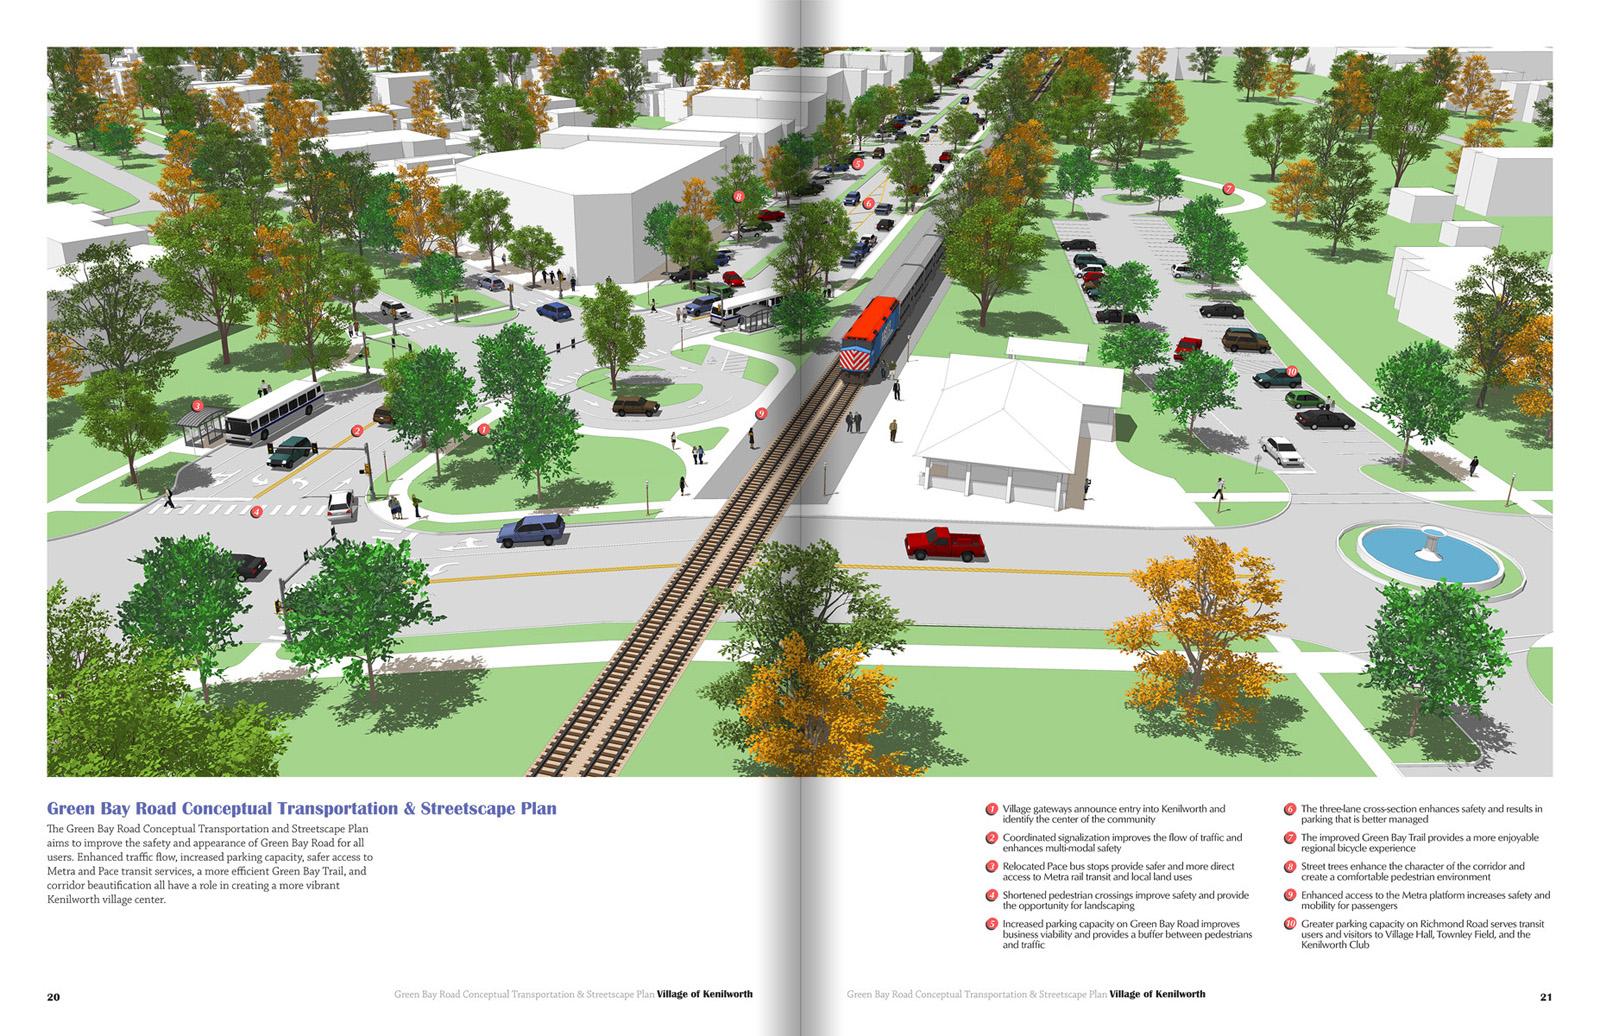 https://www.hlplanning.com/portals/wp-content/uploads/2014/10/Keniworth-Green-Bay-Road-Plan-24-and-25.jpg